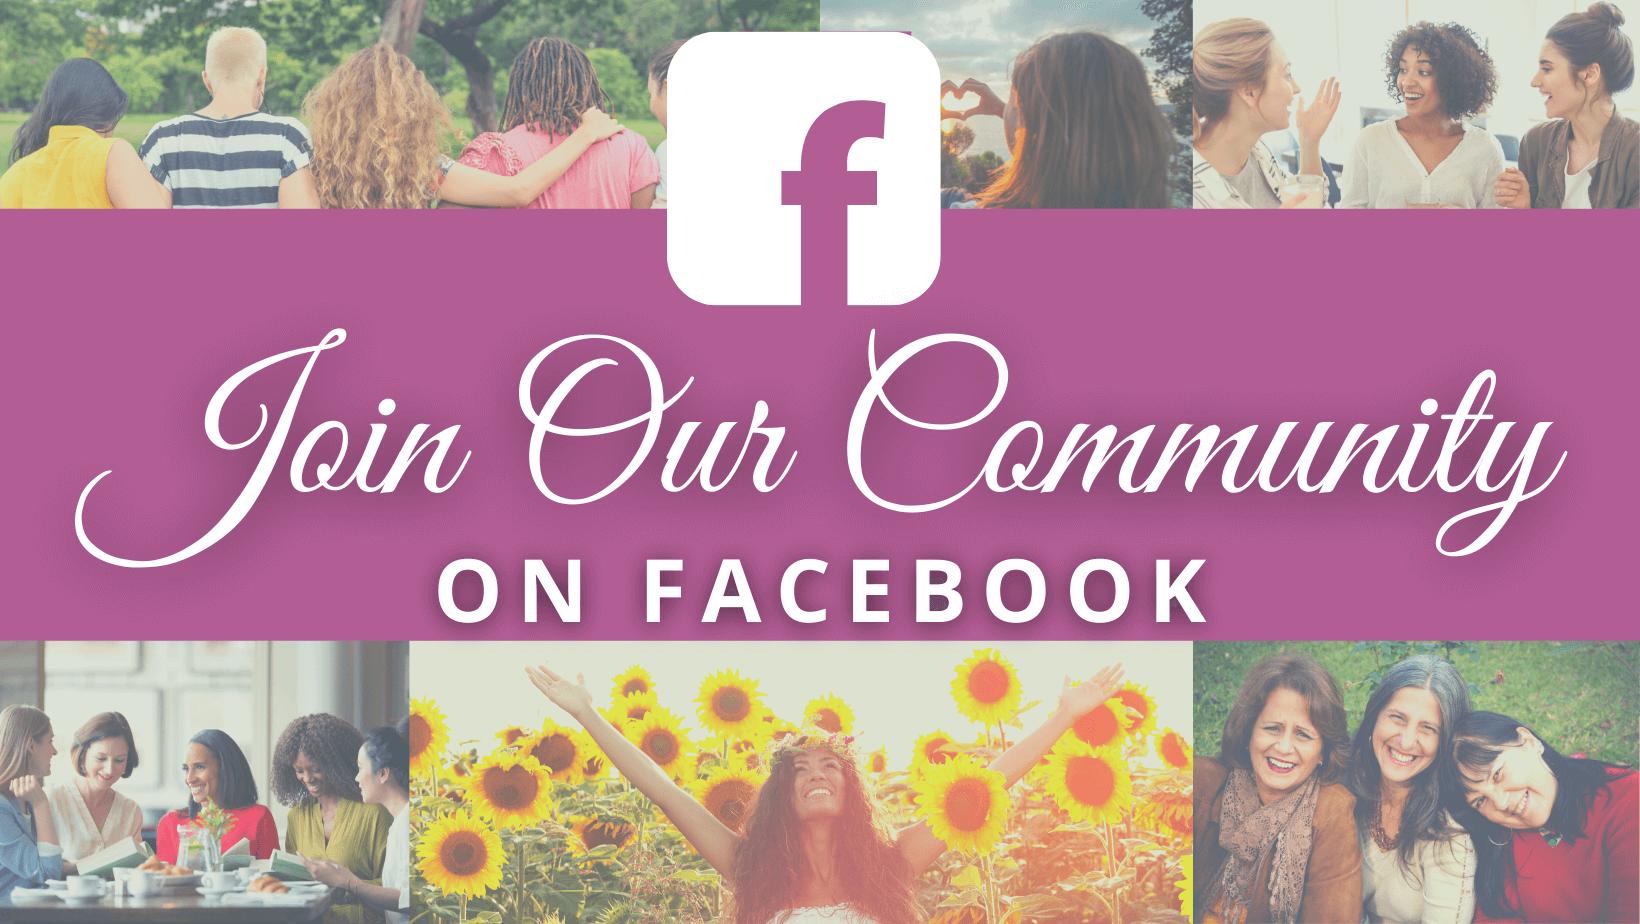 JOINFacebookCommunity